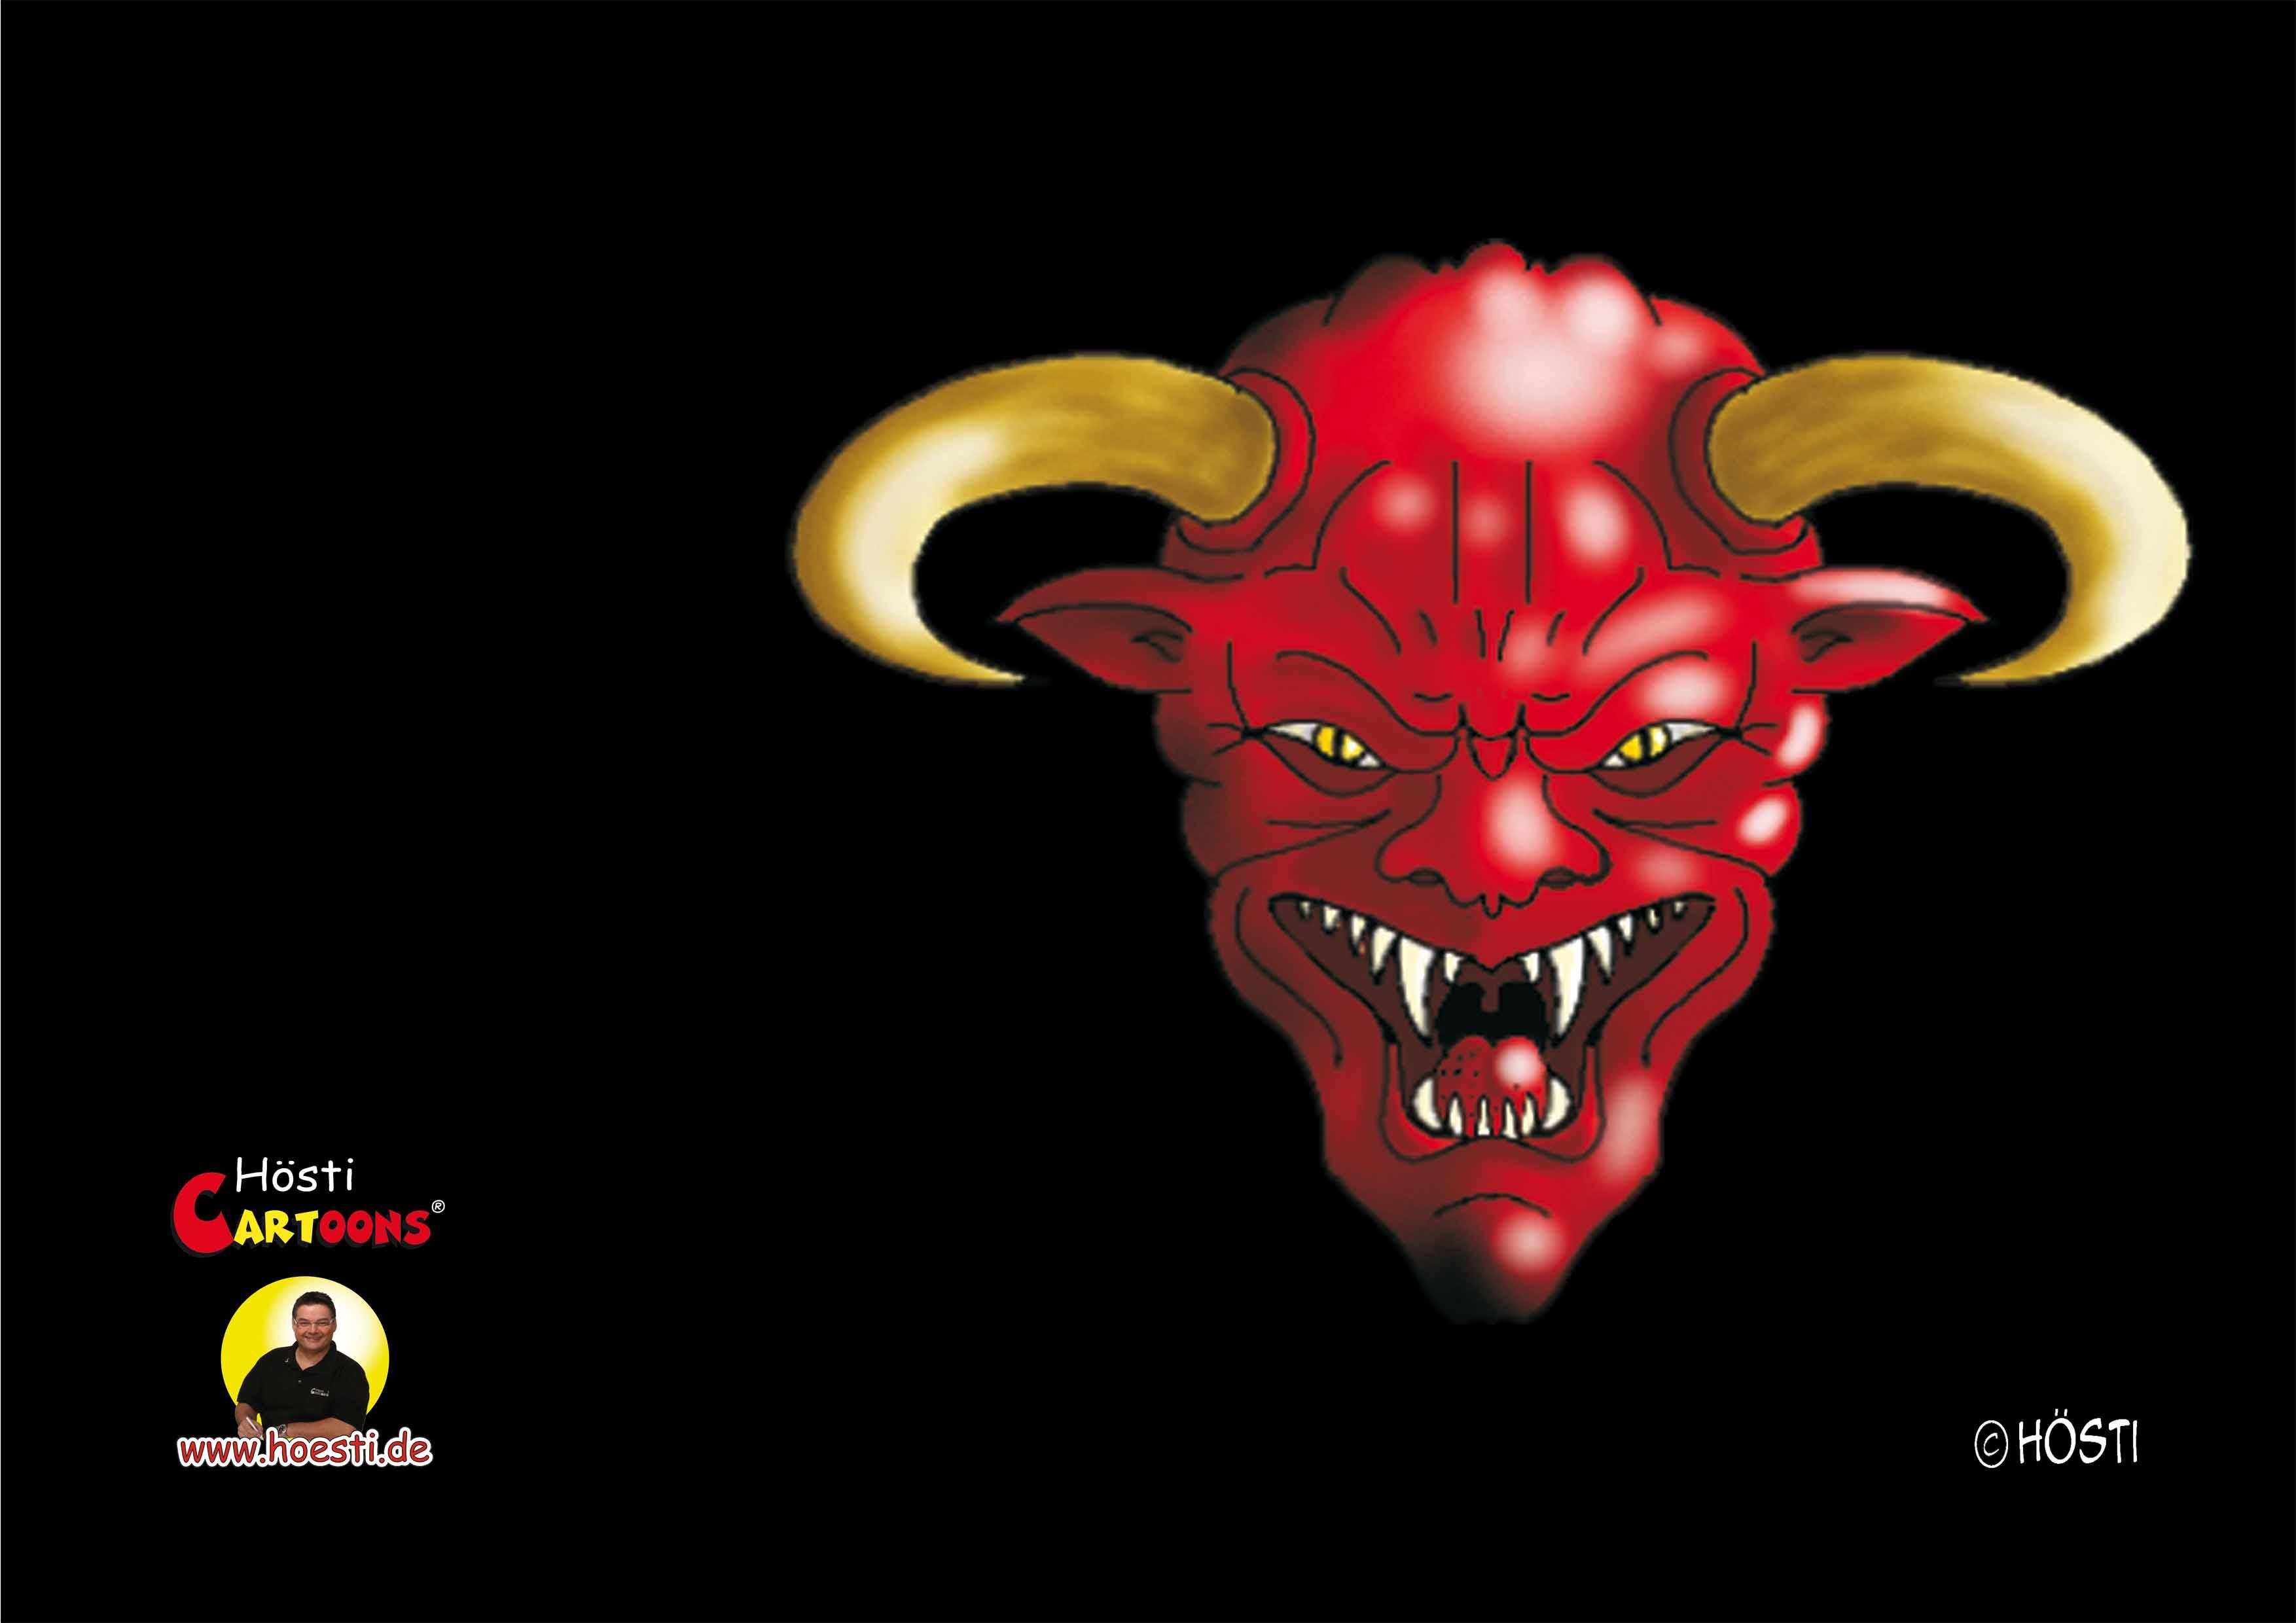 devilshead